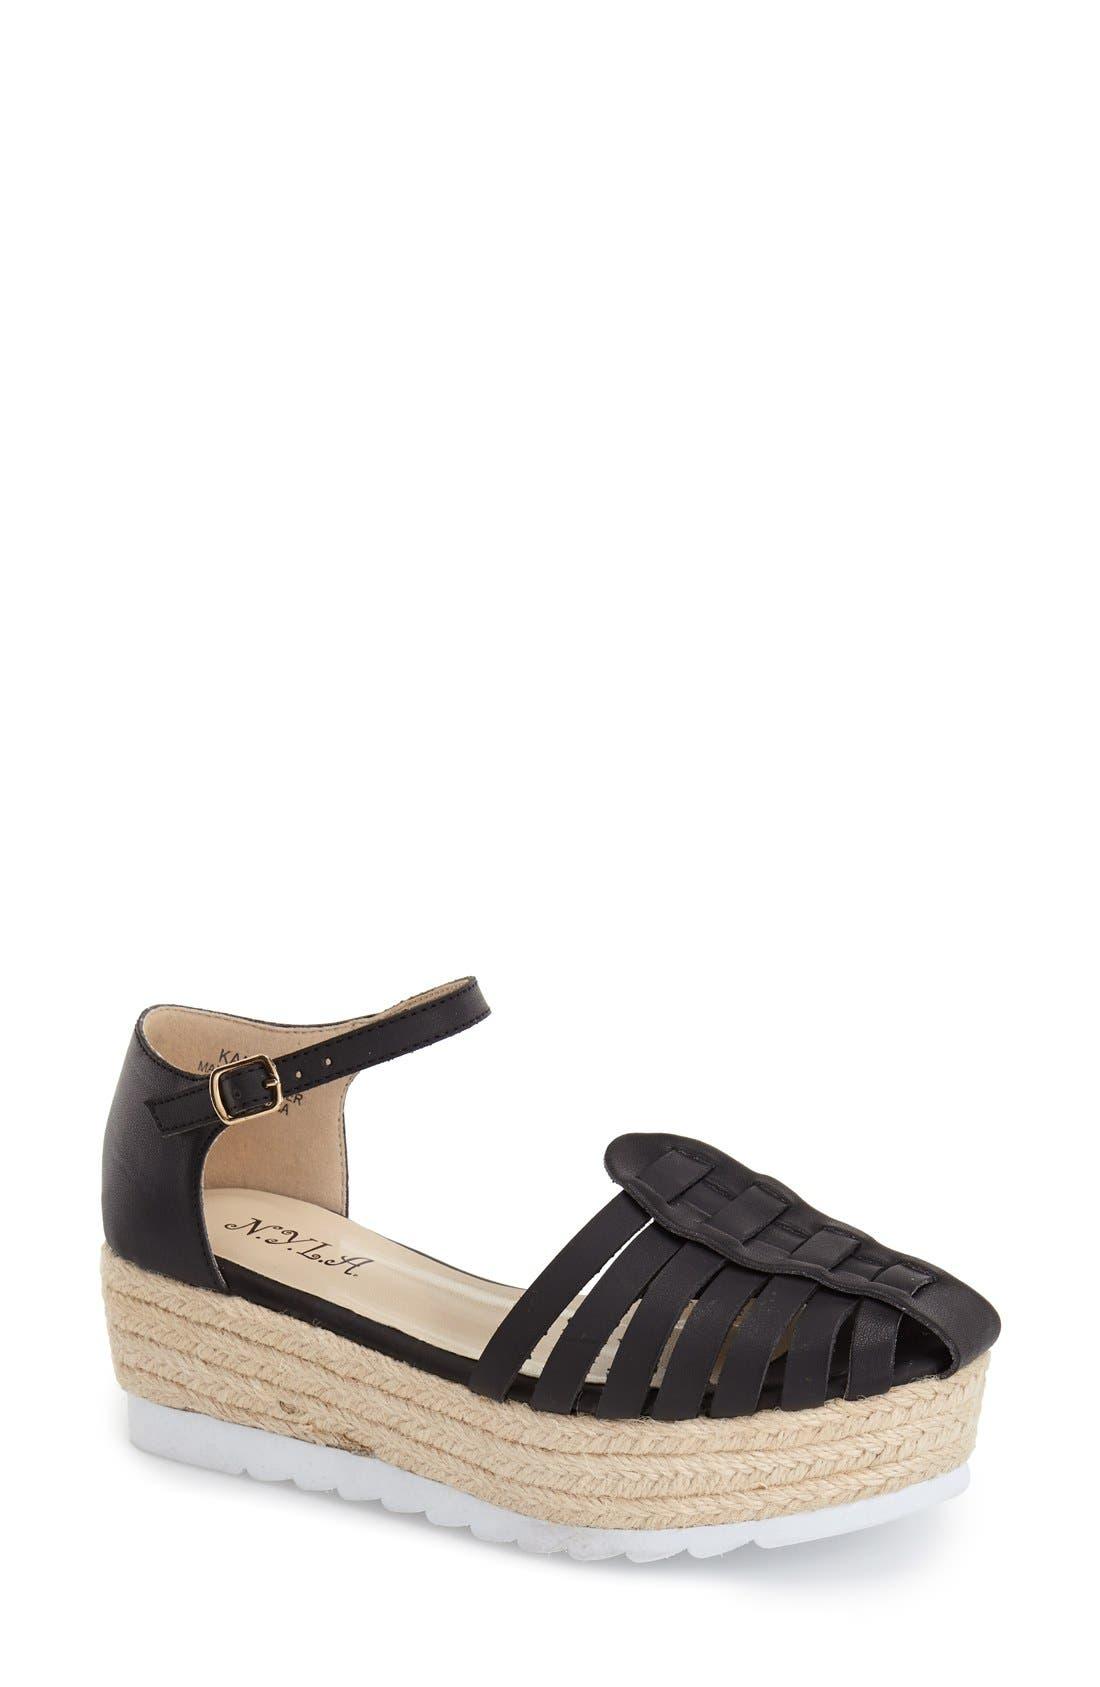 Main Image - N.Y.L.A. 'Kanen' Espadrille Platform Sandal (Women)